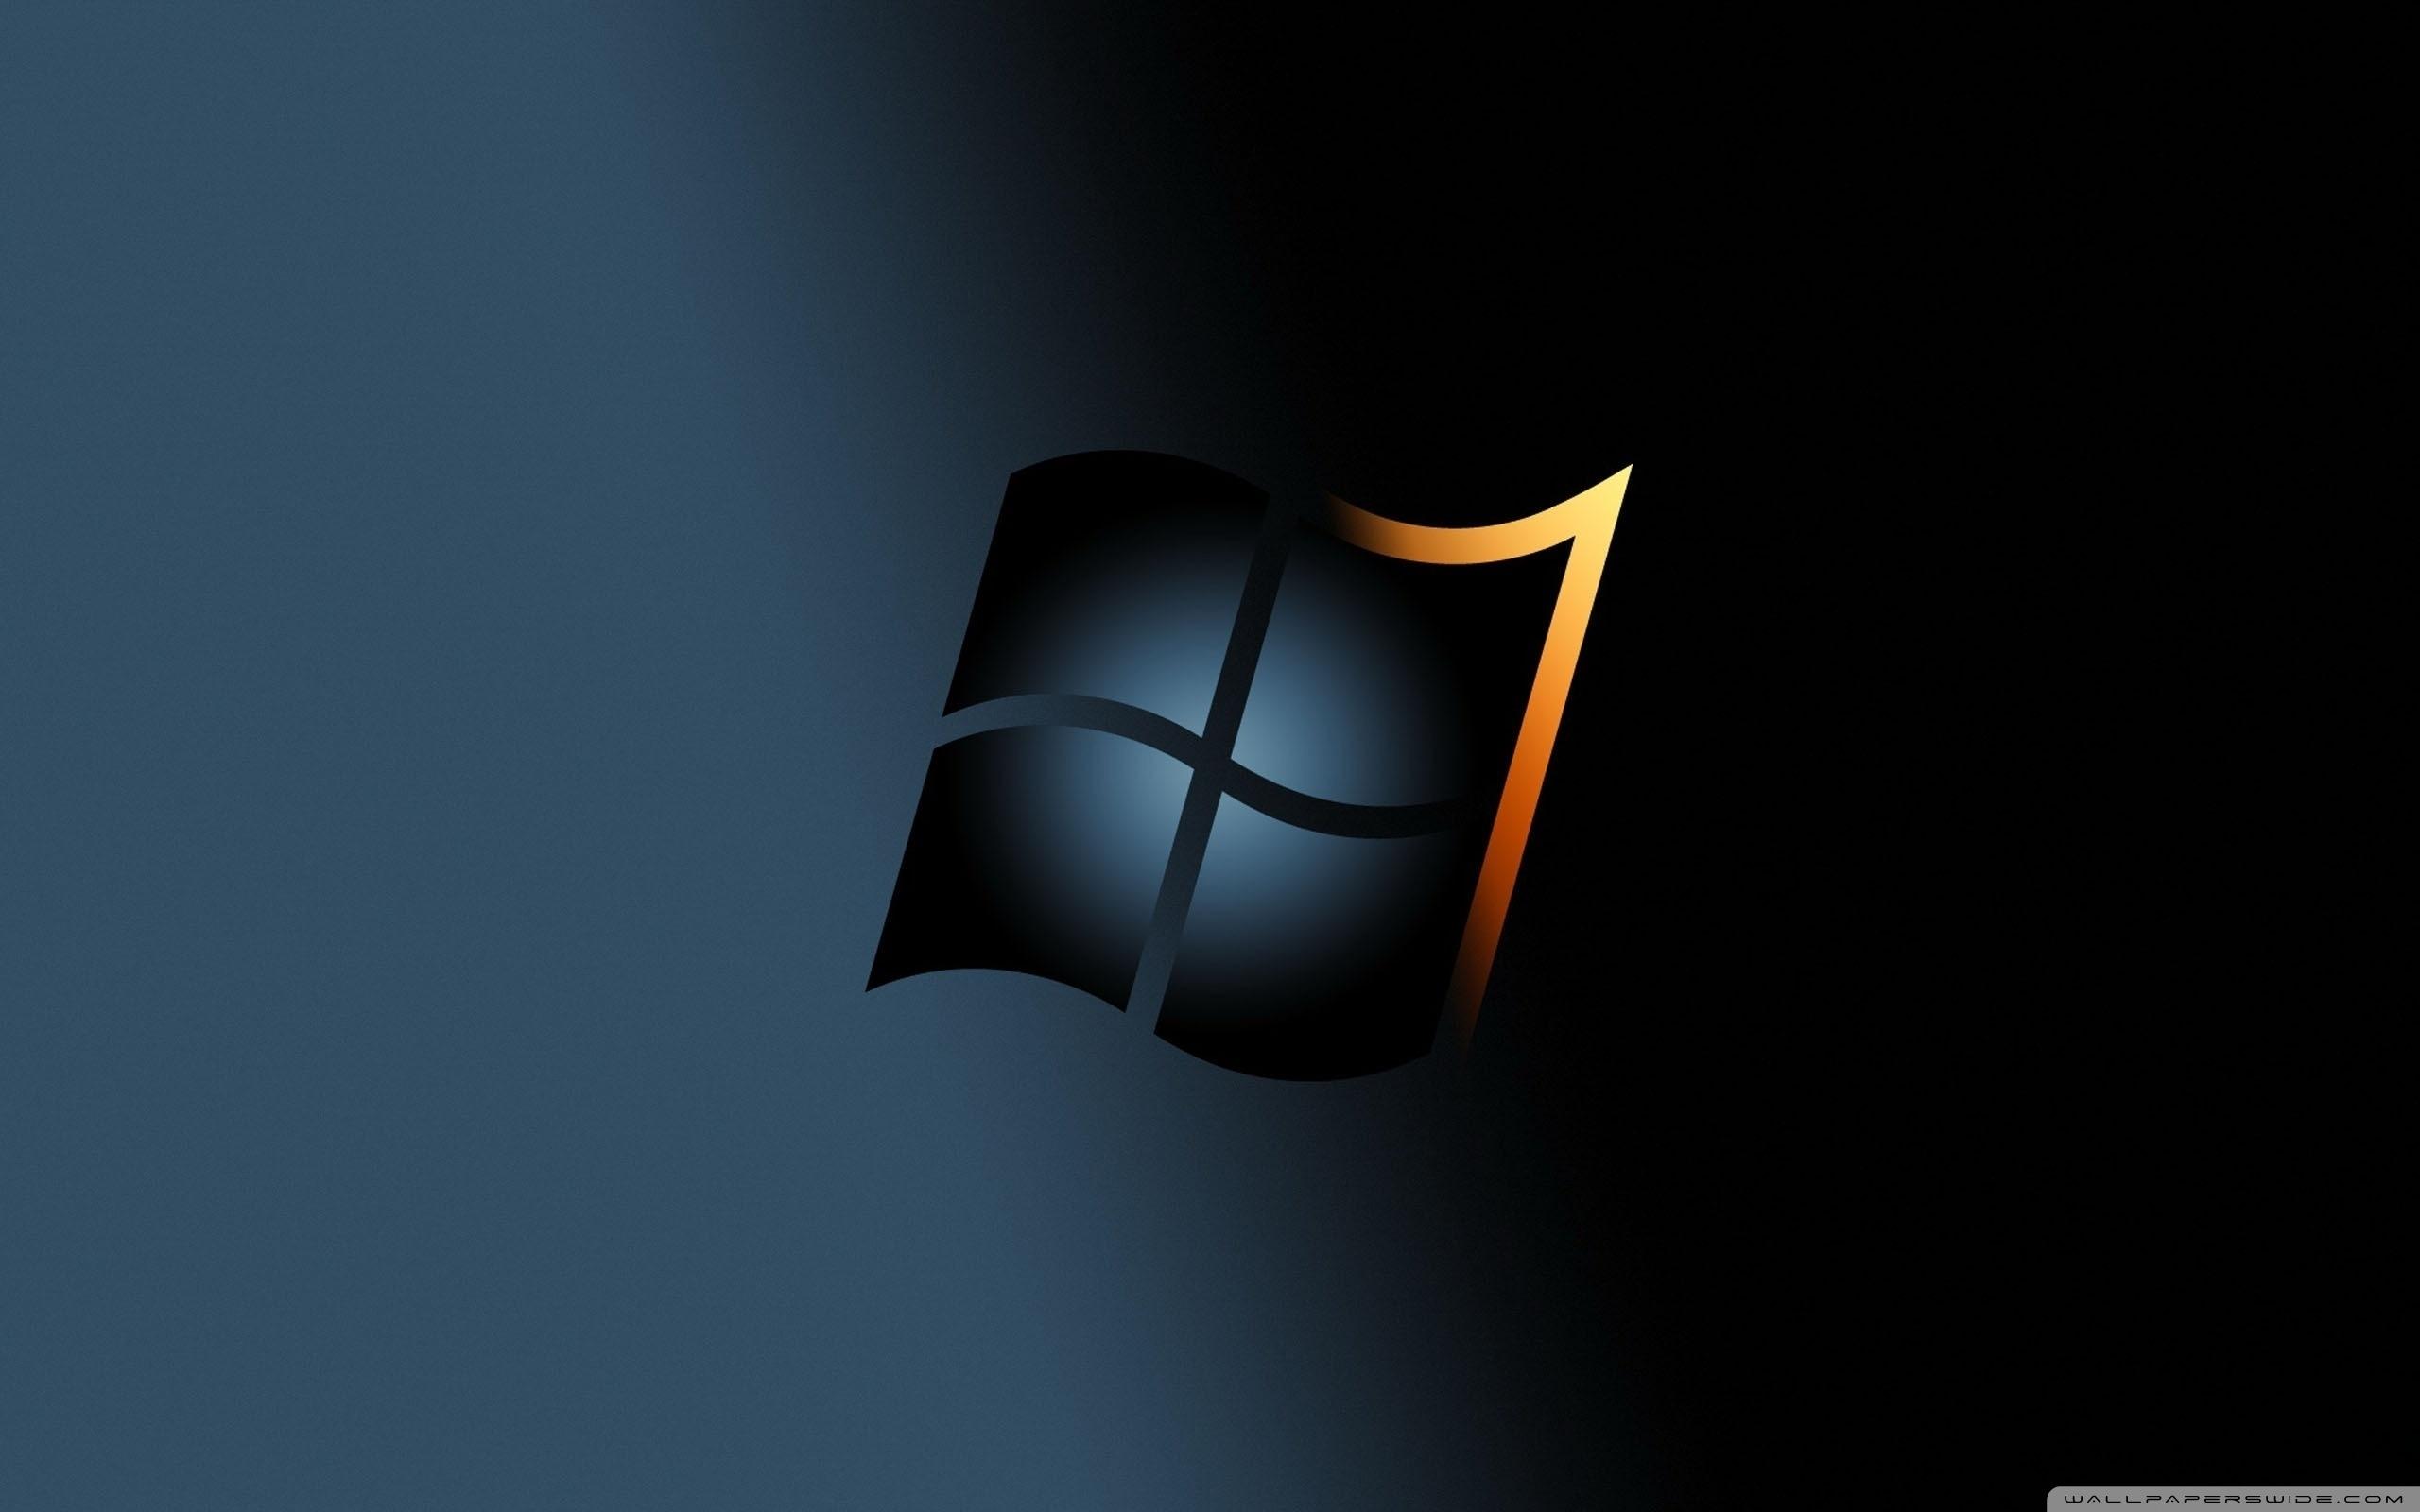 windows 7 dark ❤ 4k hd desktop wallpaper for 4k ultra hd tv • dual